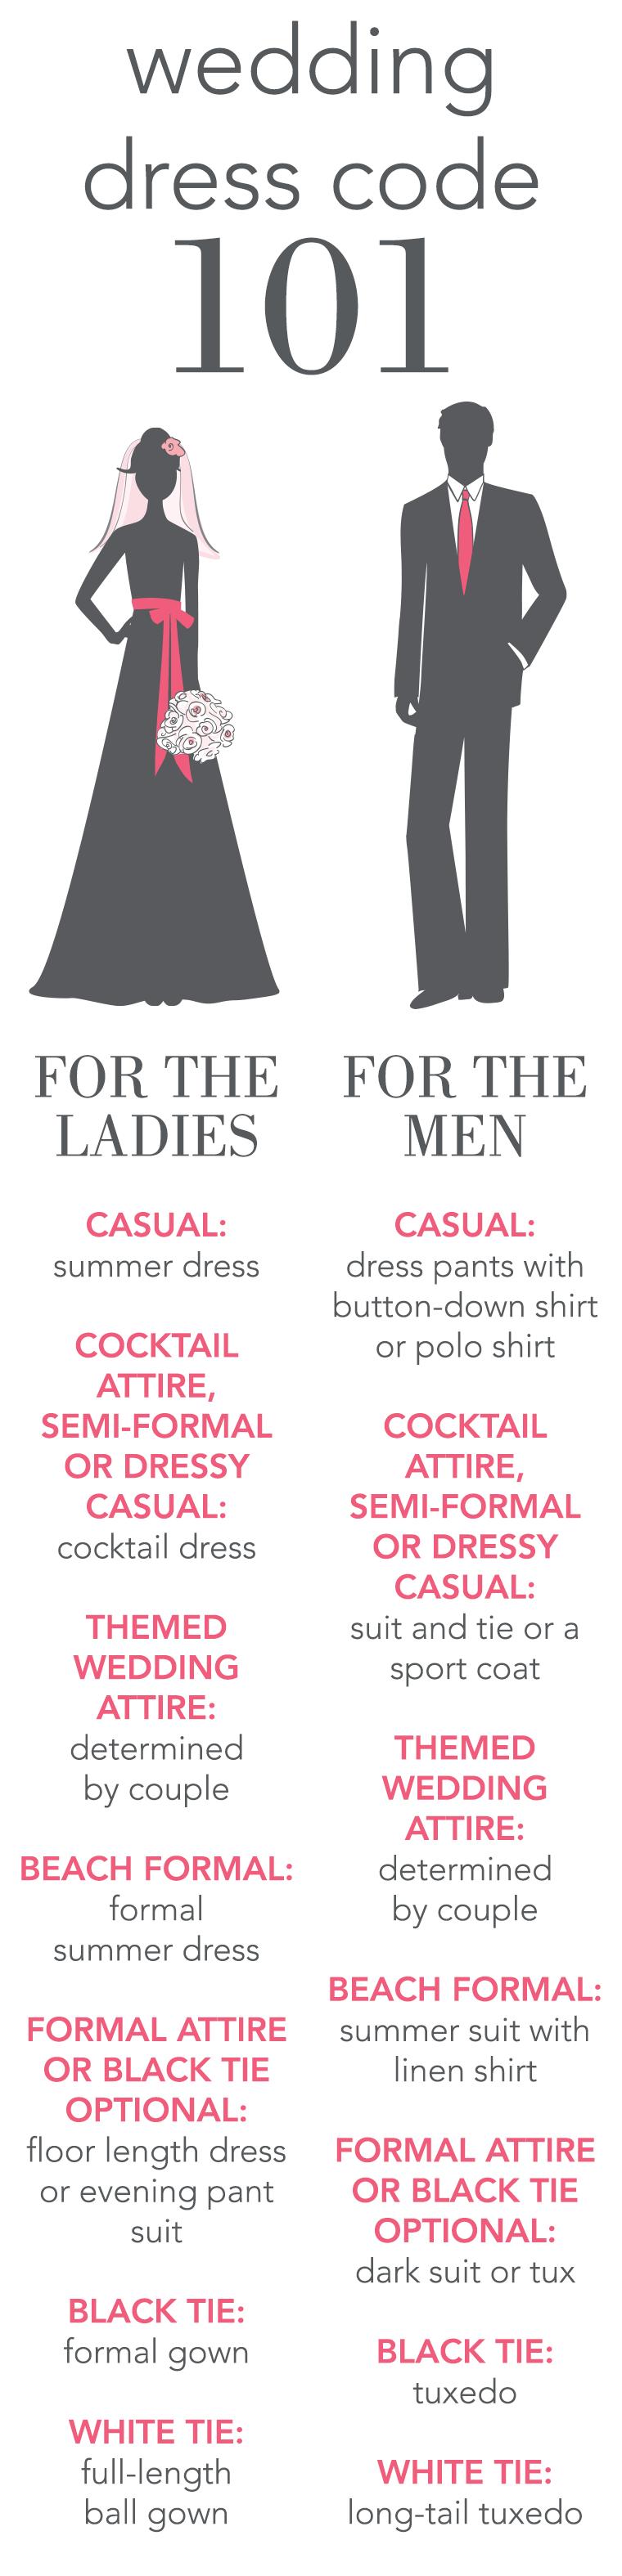 Wedding Dress Code.png